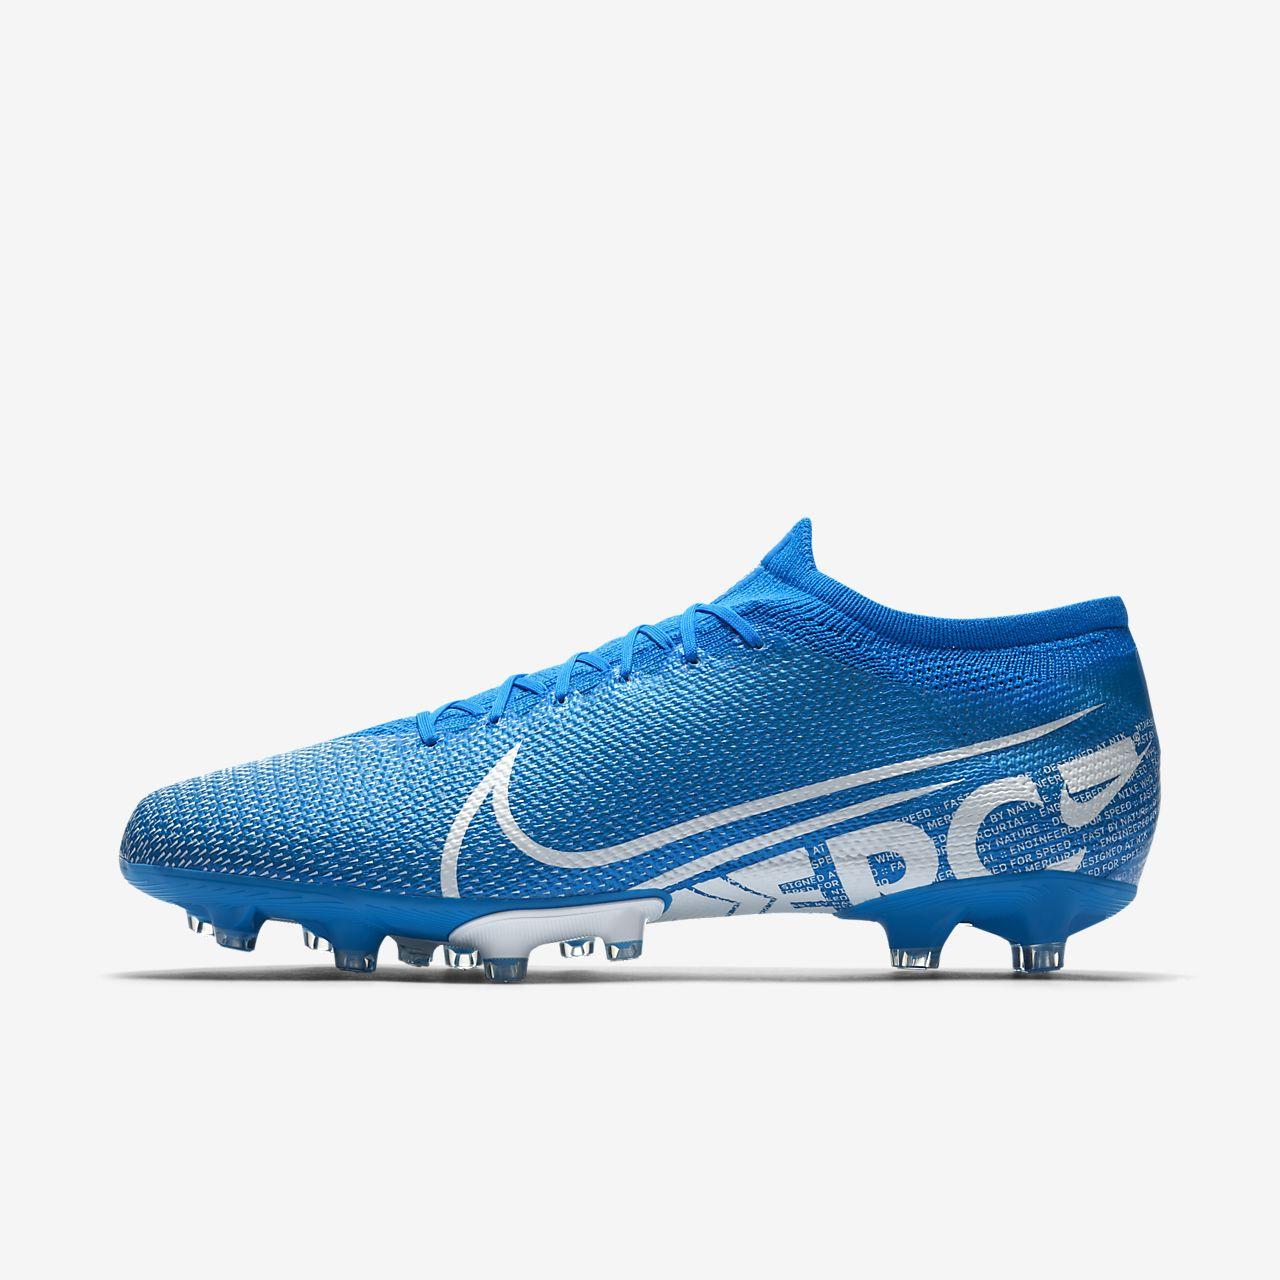 Césped Botas Fútbol 13 De Pro Para Nike Mercurial Vapor Ag Artificial 7f6gbyvY